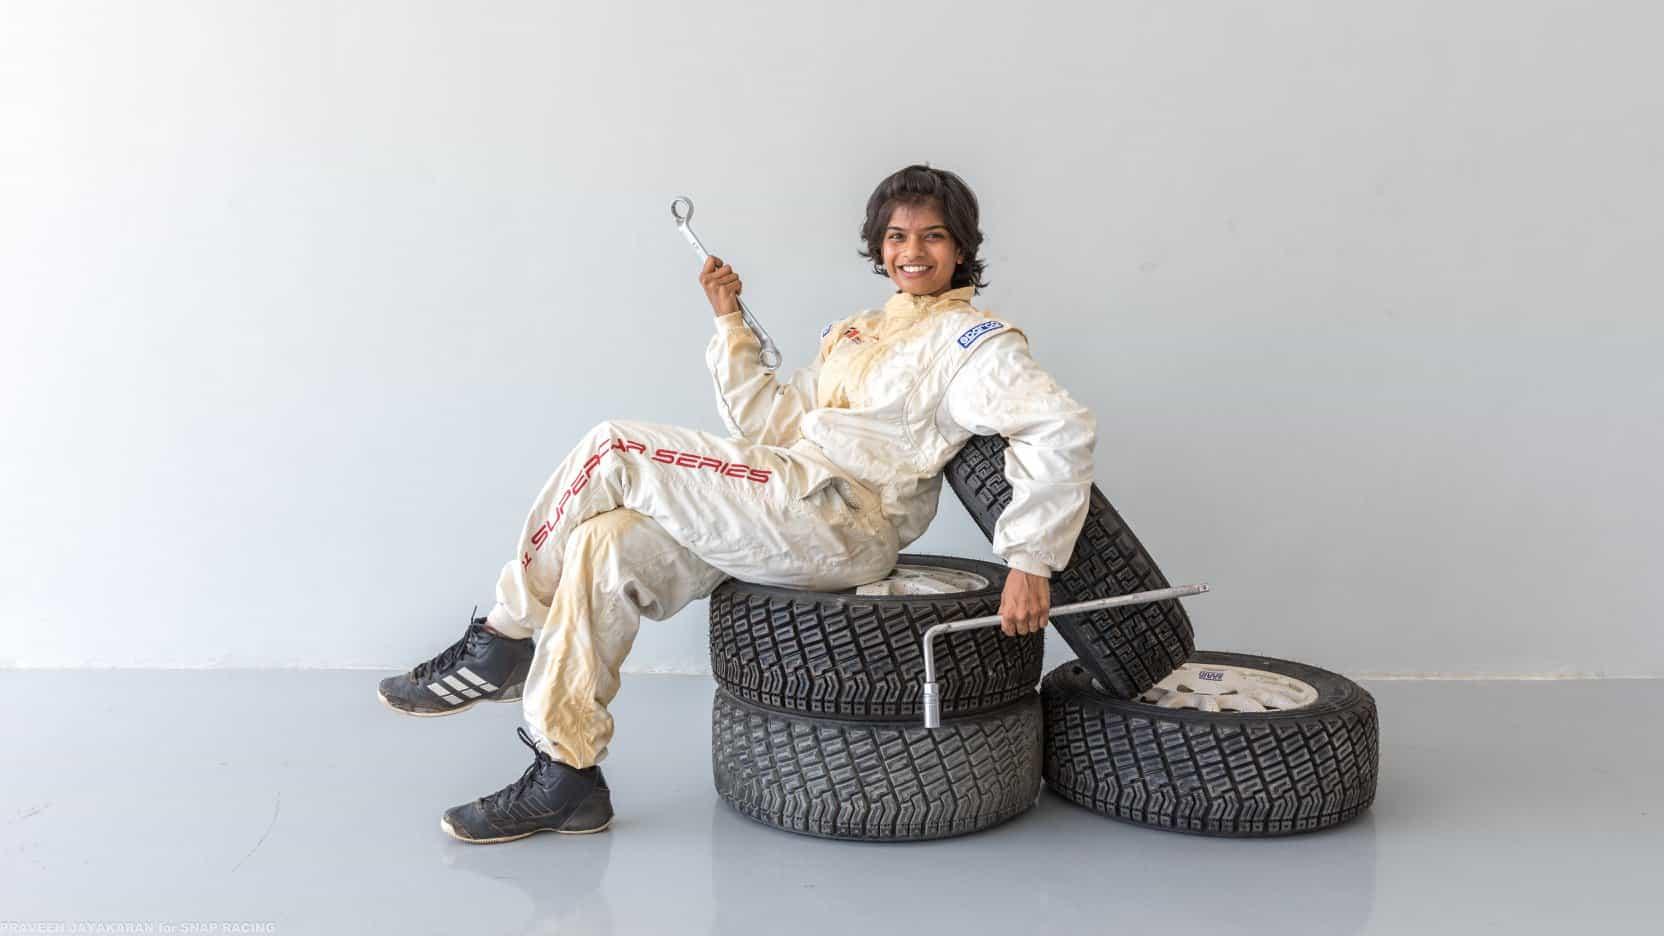 Glxy-Priyamvada-car-racer